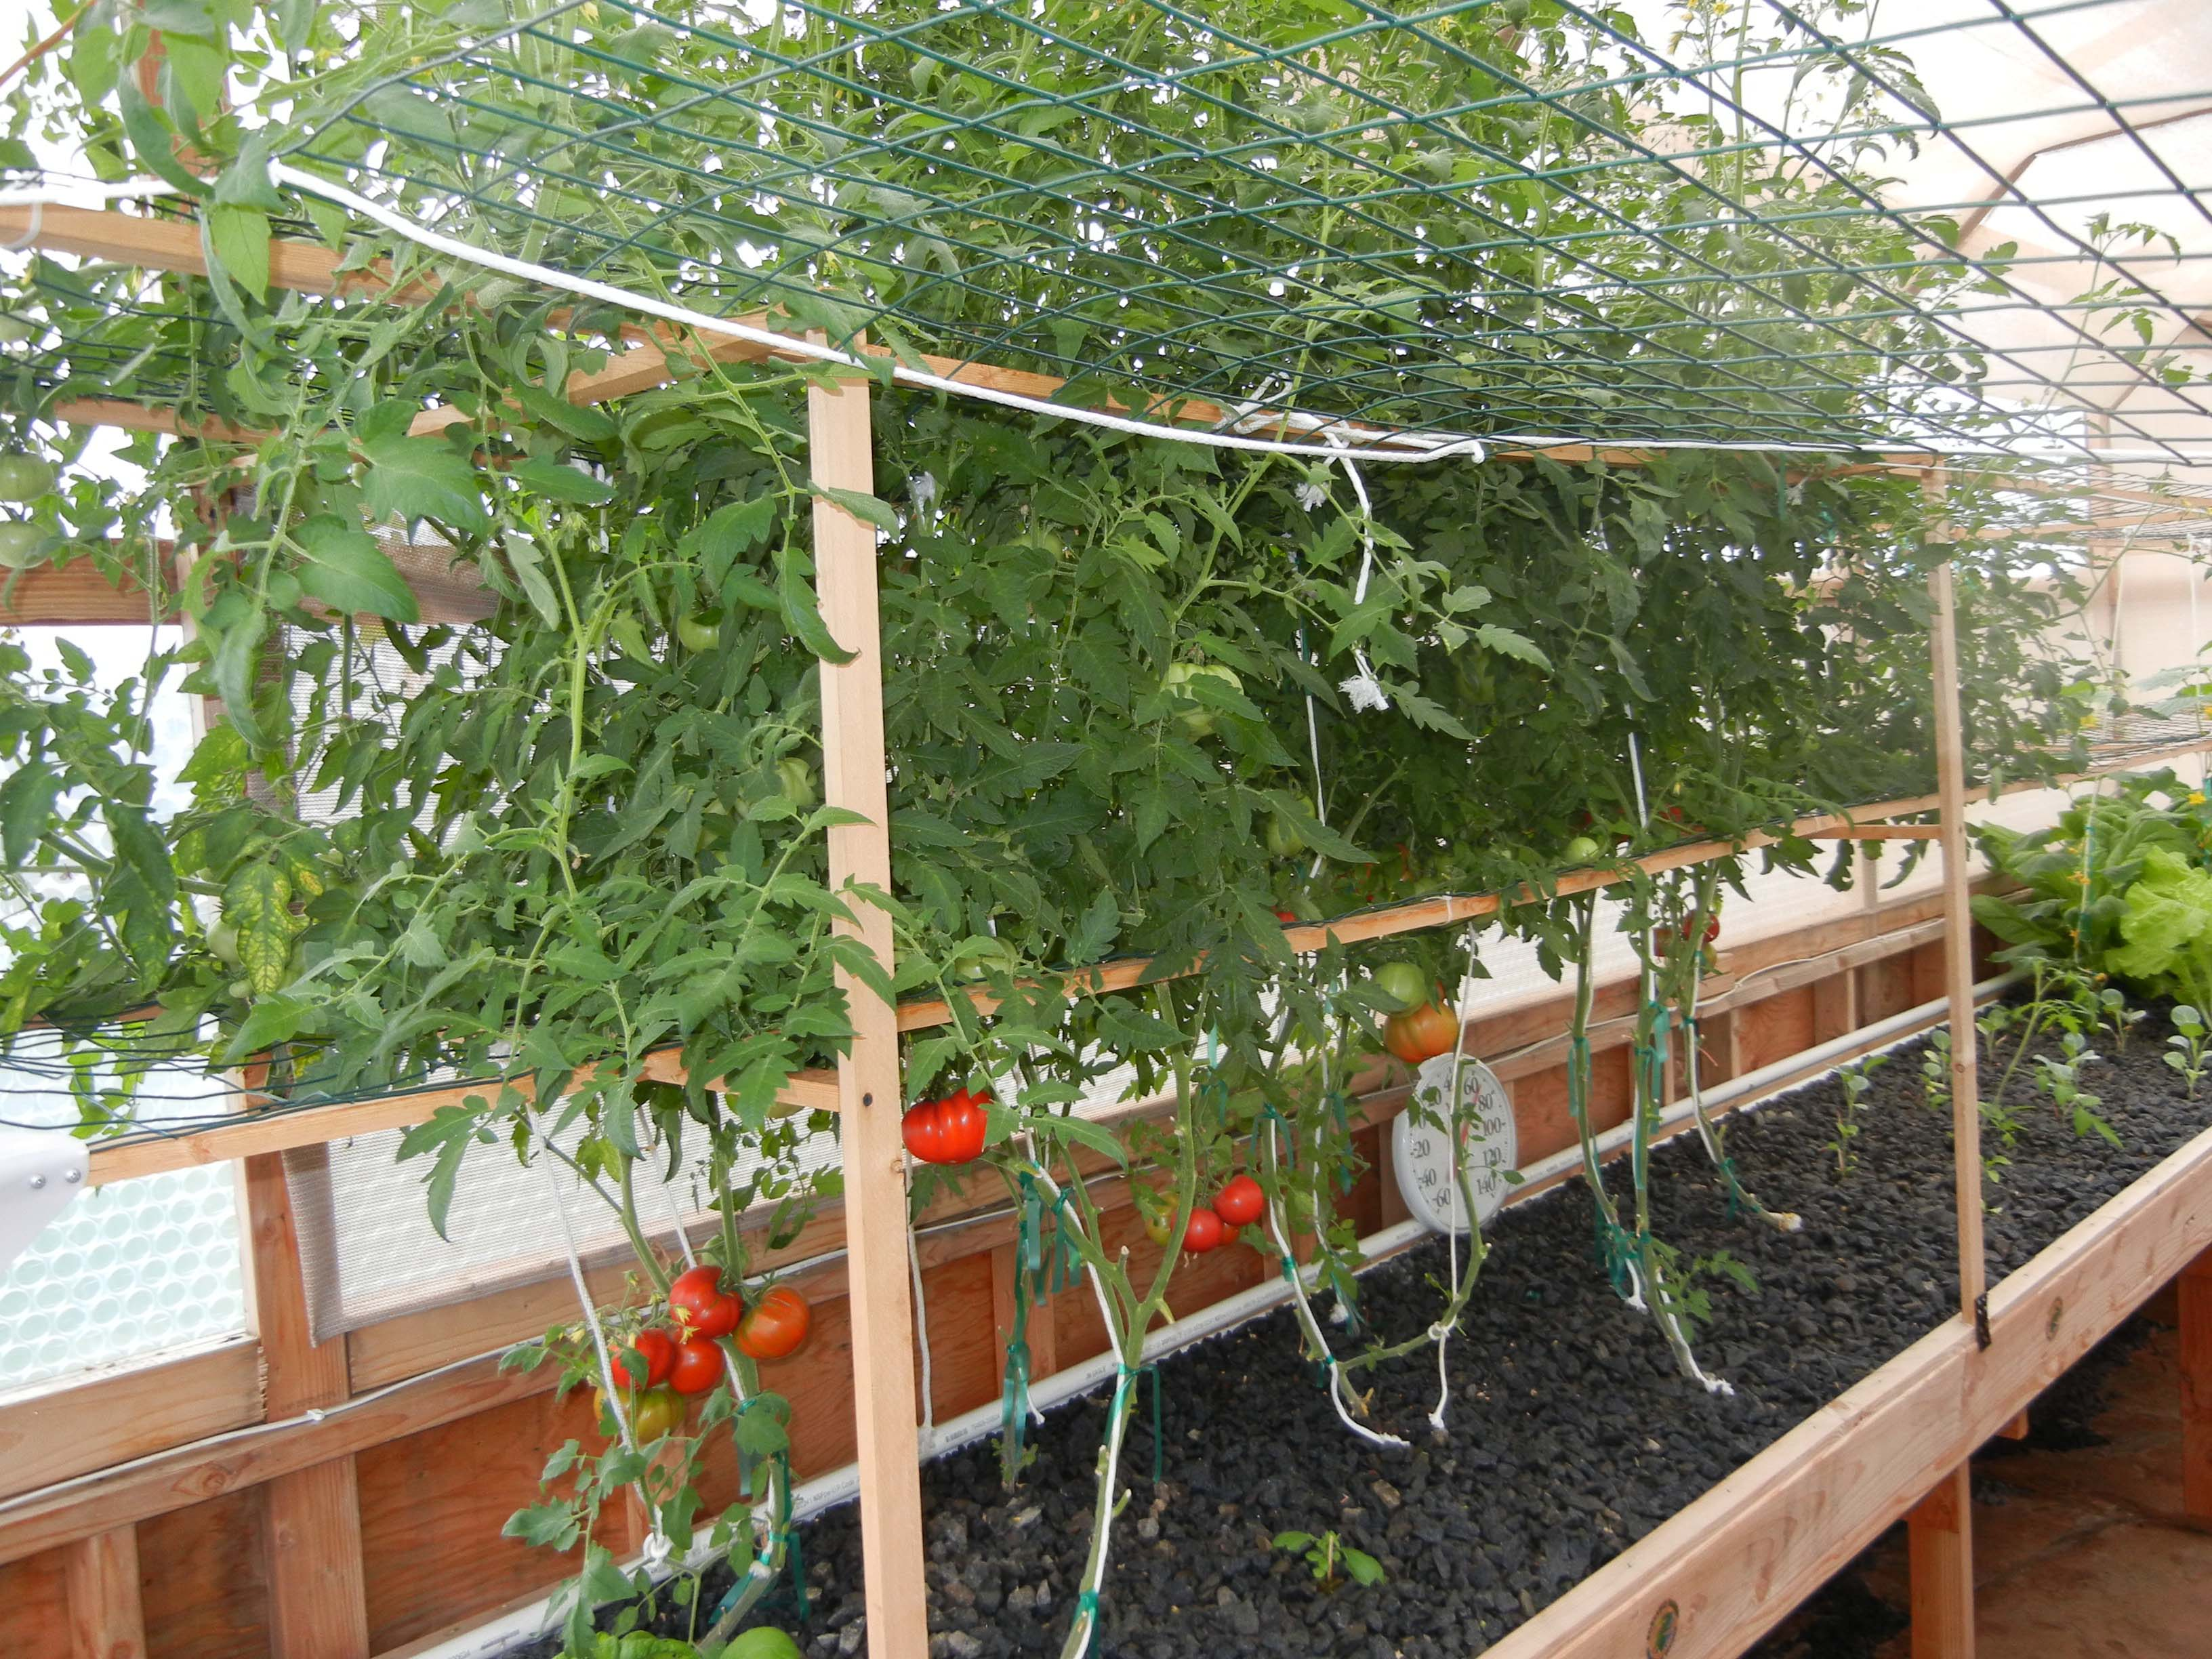 how to start an aquaponics garden